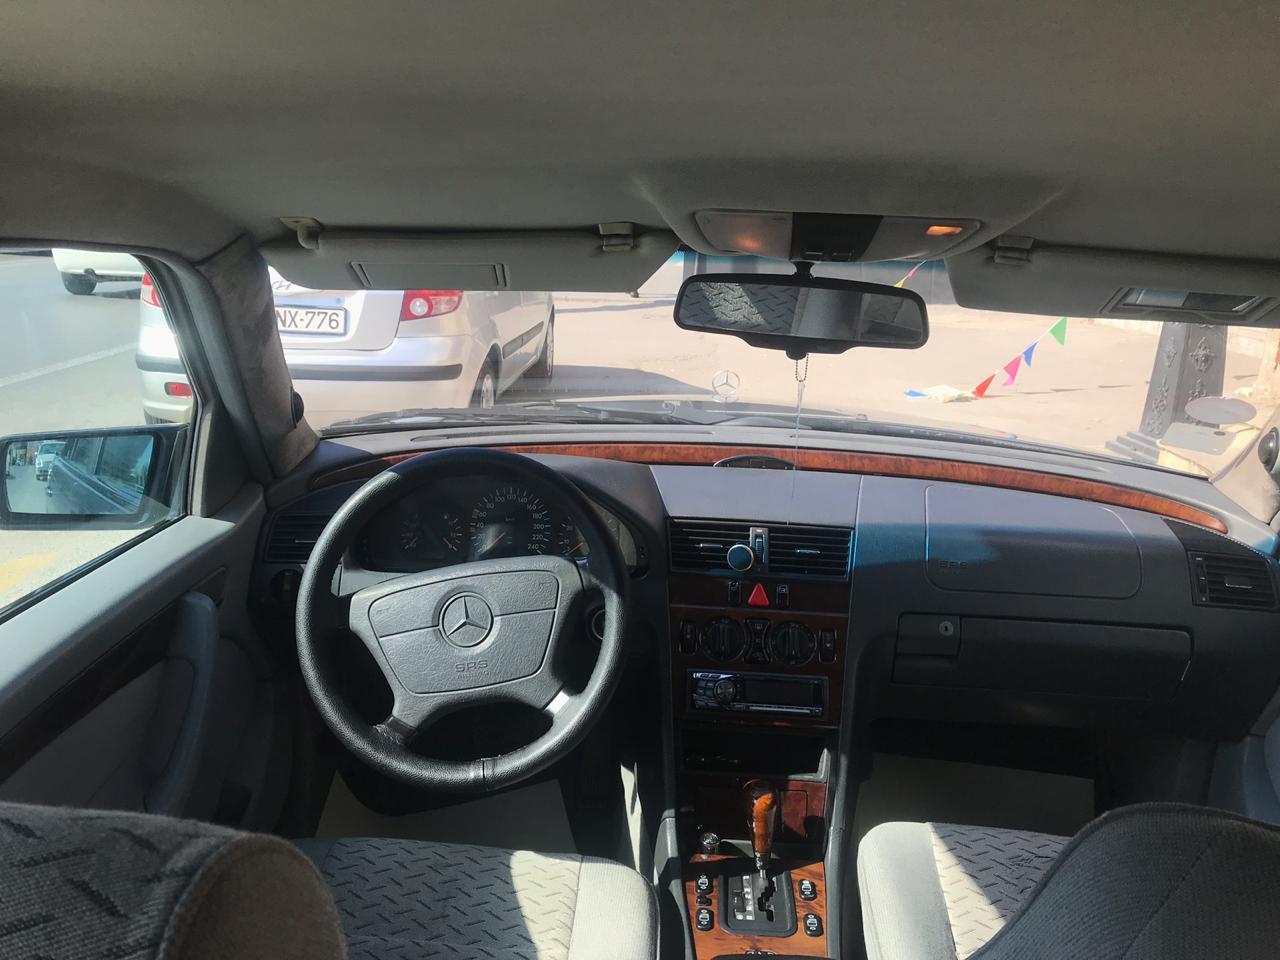 Mercedes-Benz C 200 2.0(lt) 1996 Second hand  $5000